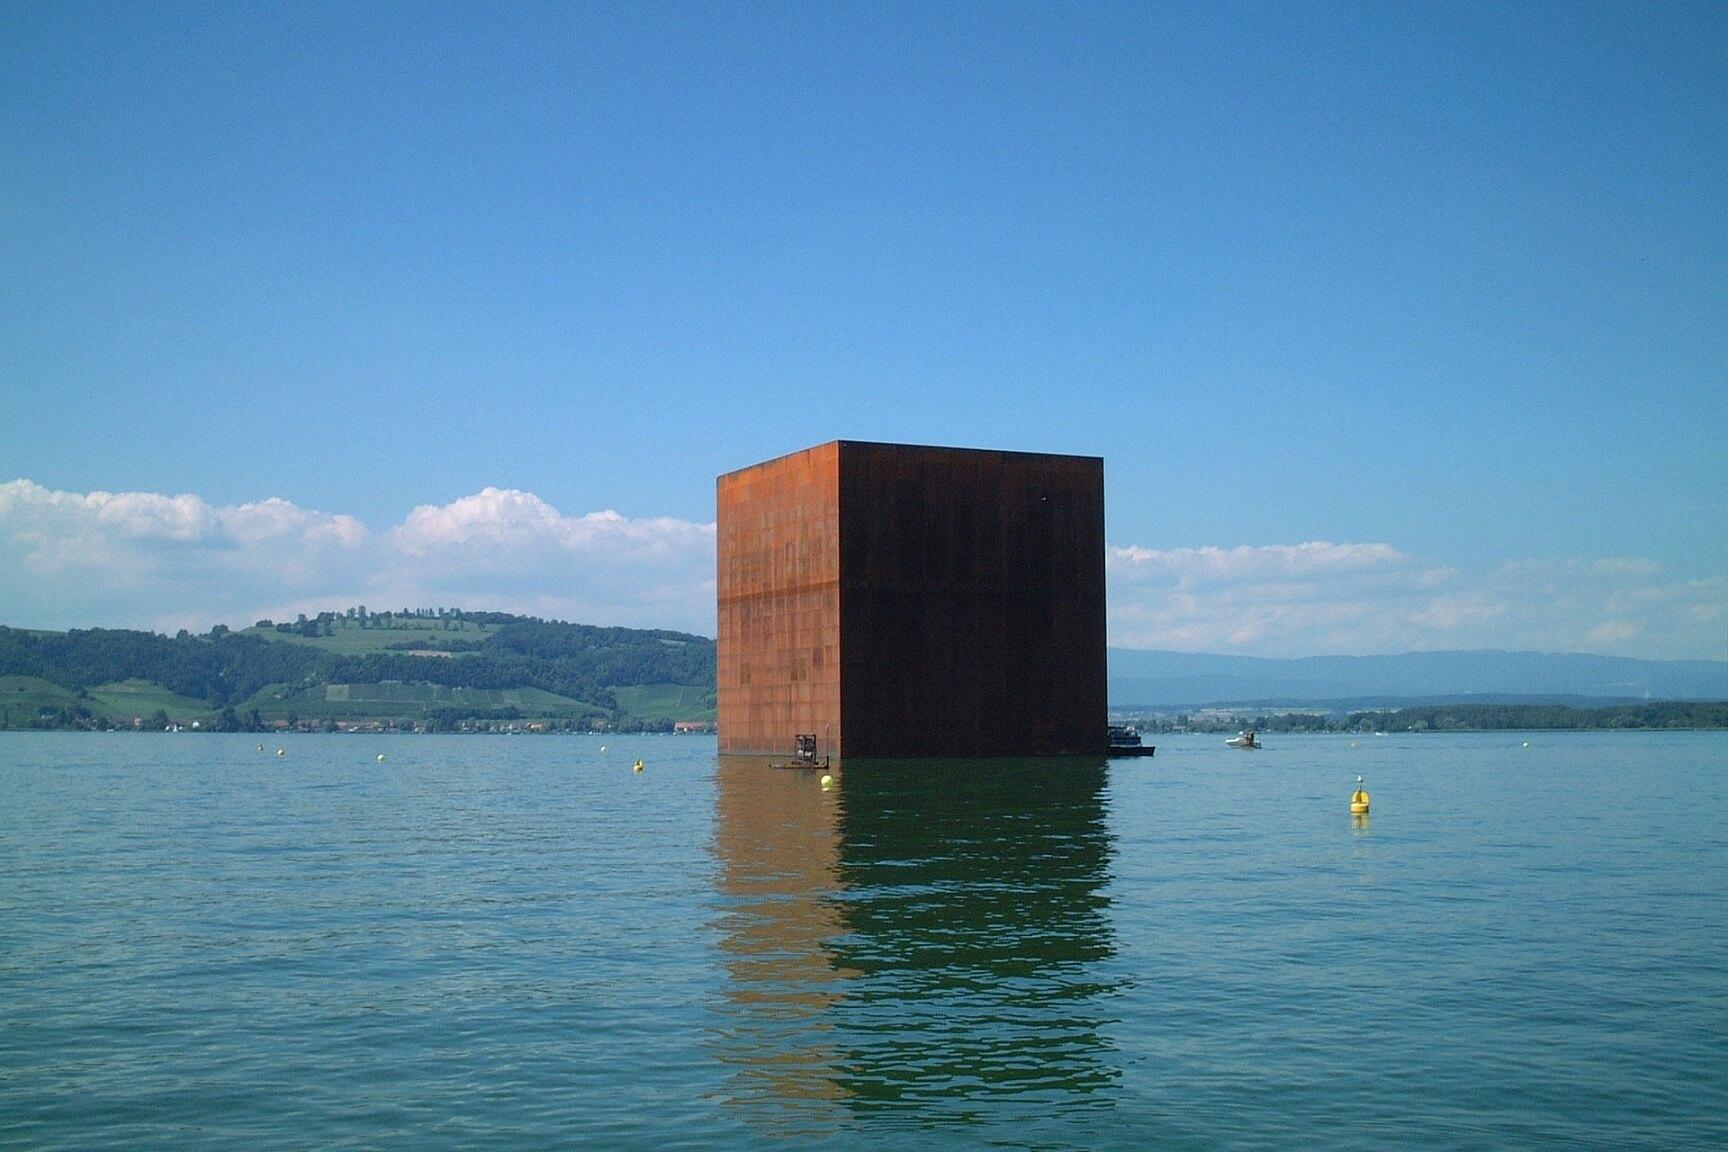 ژان نوول Monolith for Expo.02